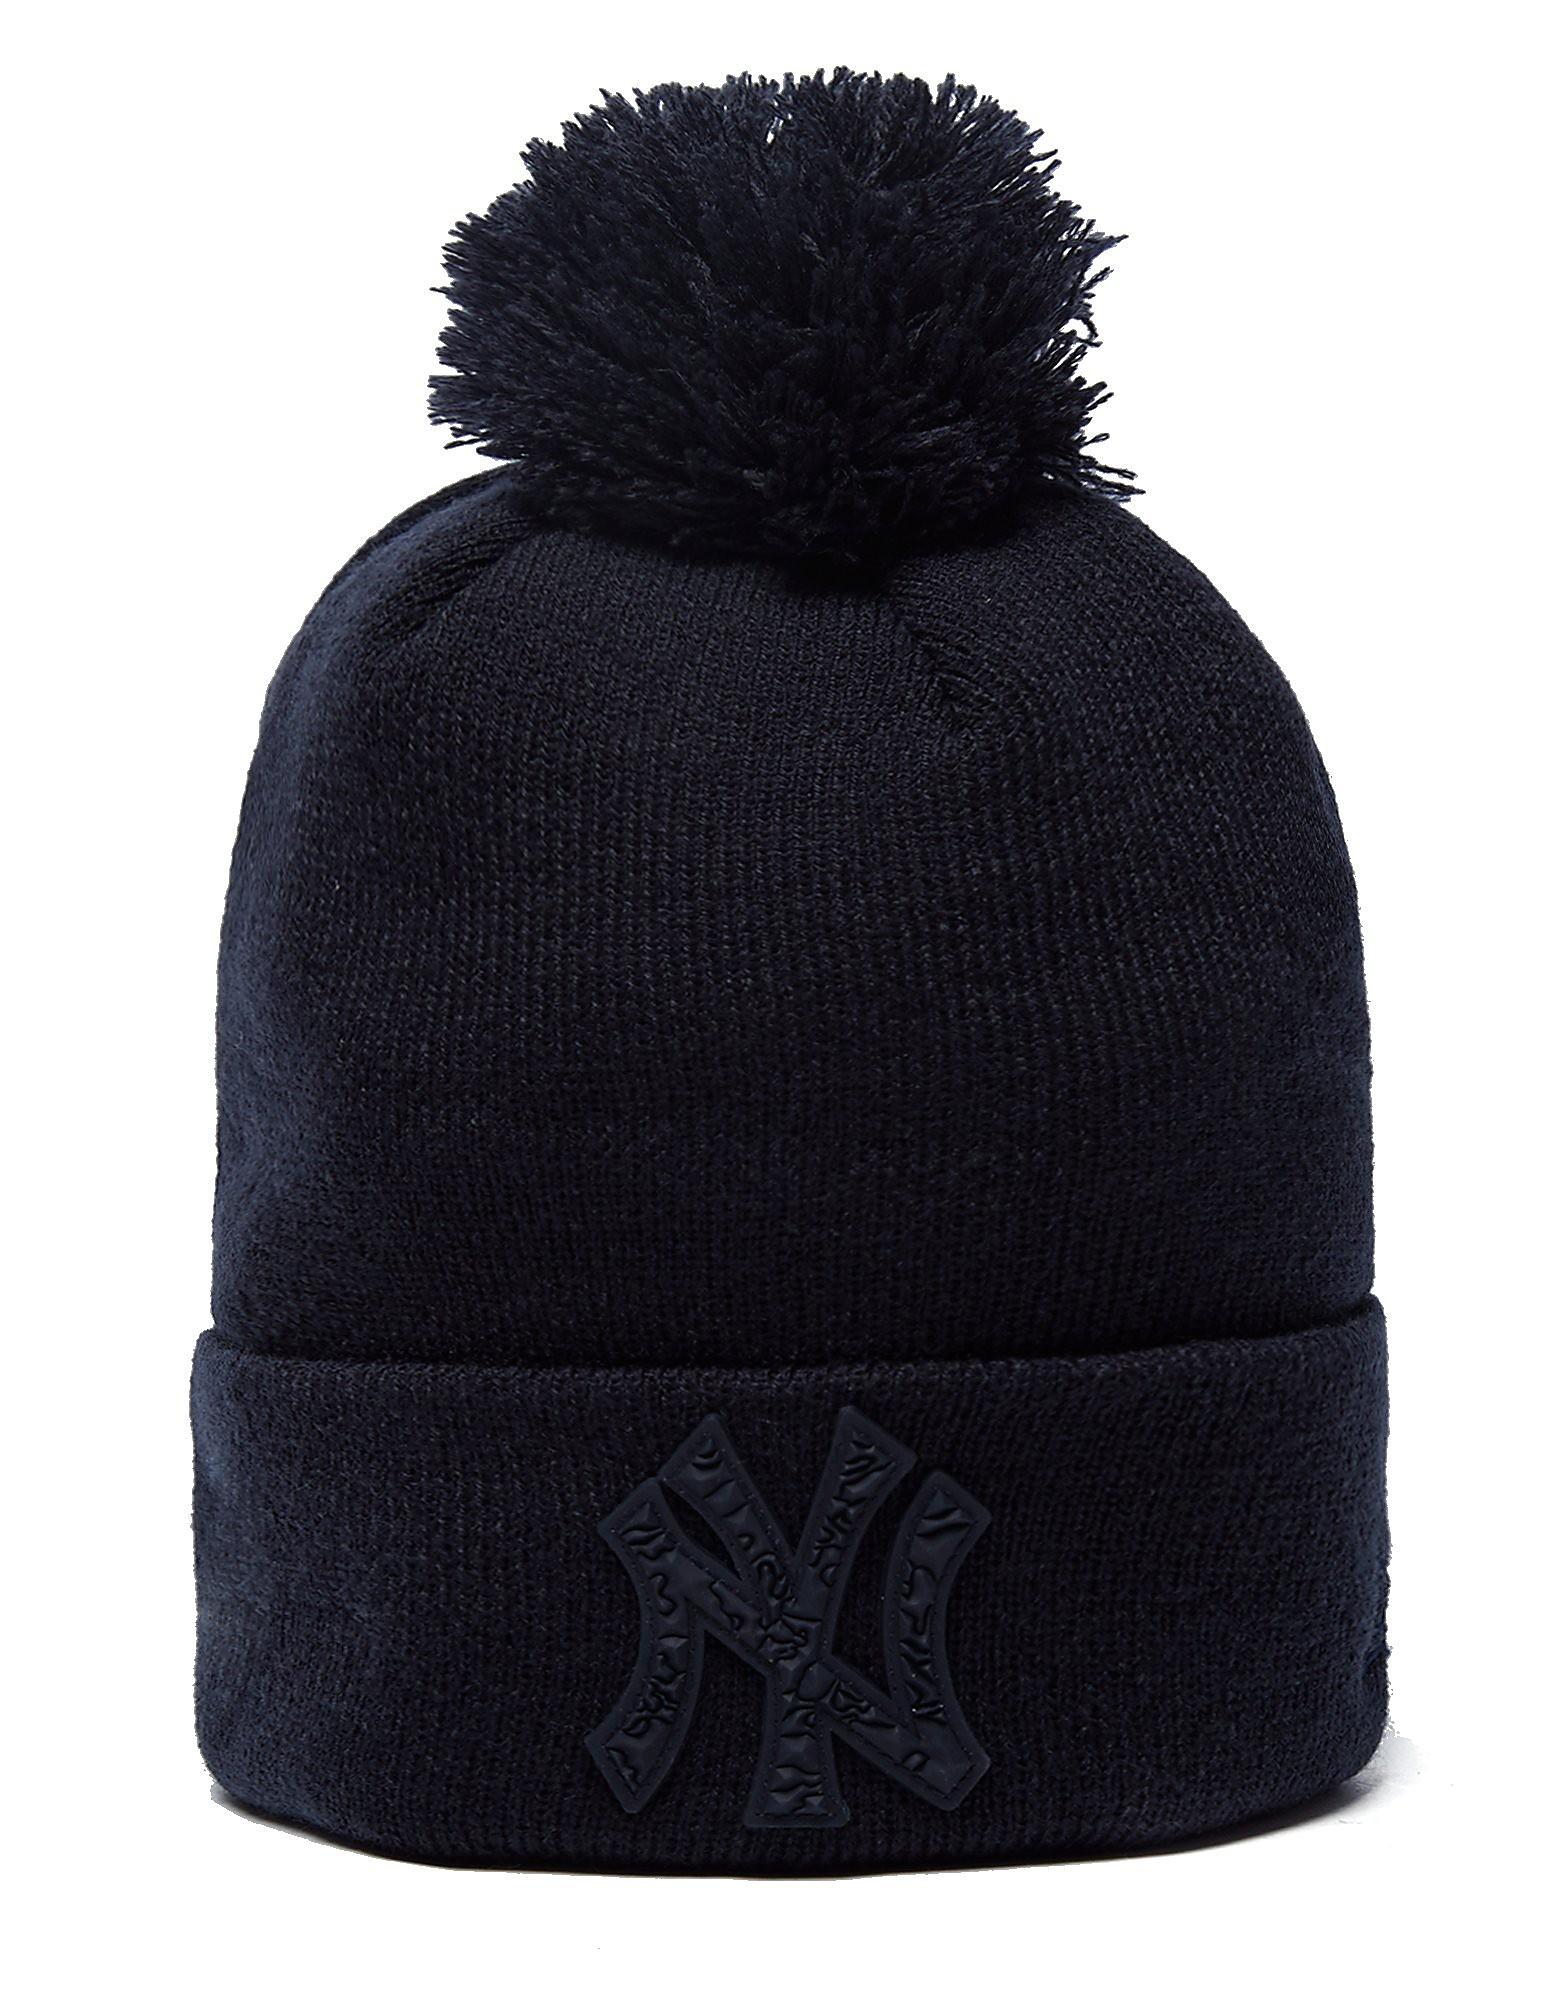 New Era MLB New York Yankees Pom Beanie